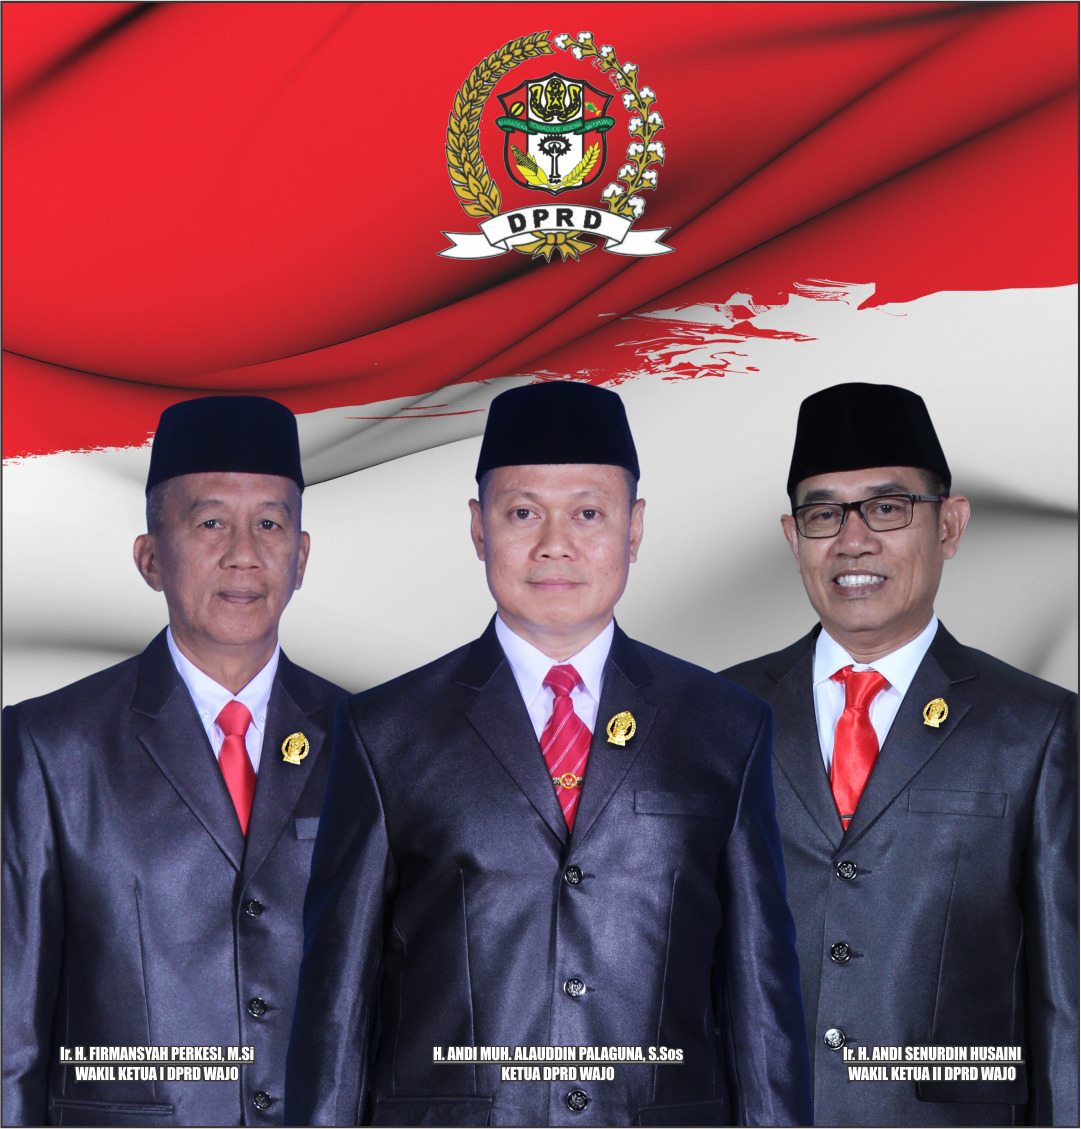 Tiga Pimpinan Definitif DPRD Wajo Bakal Dilantik Pekan Depan